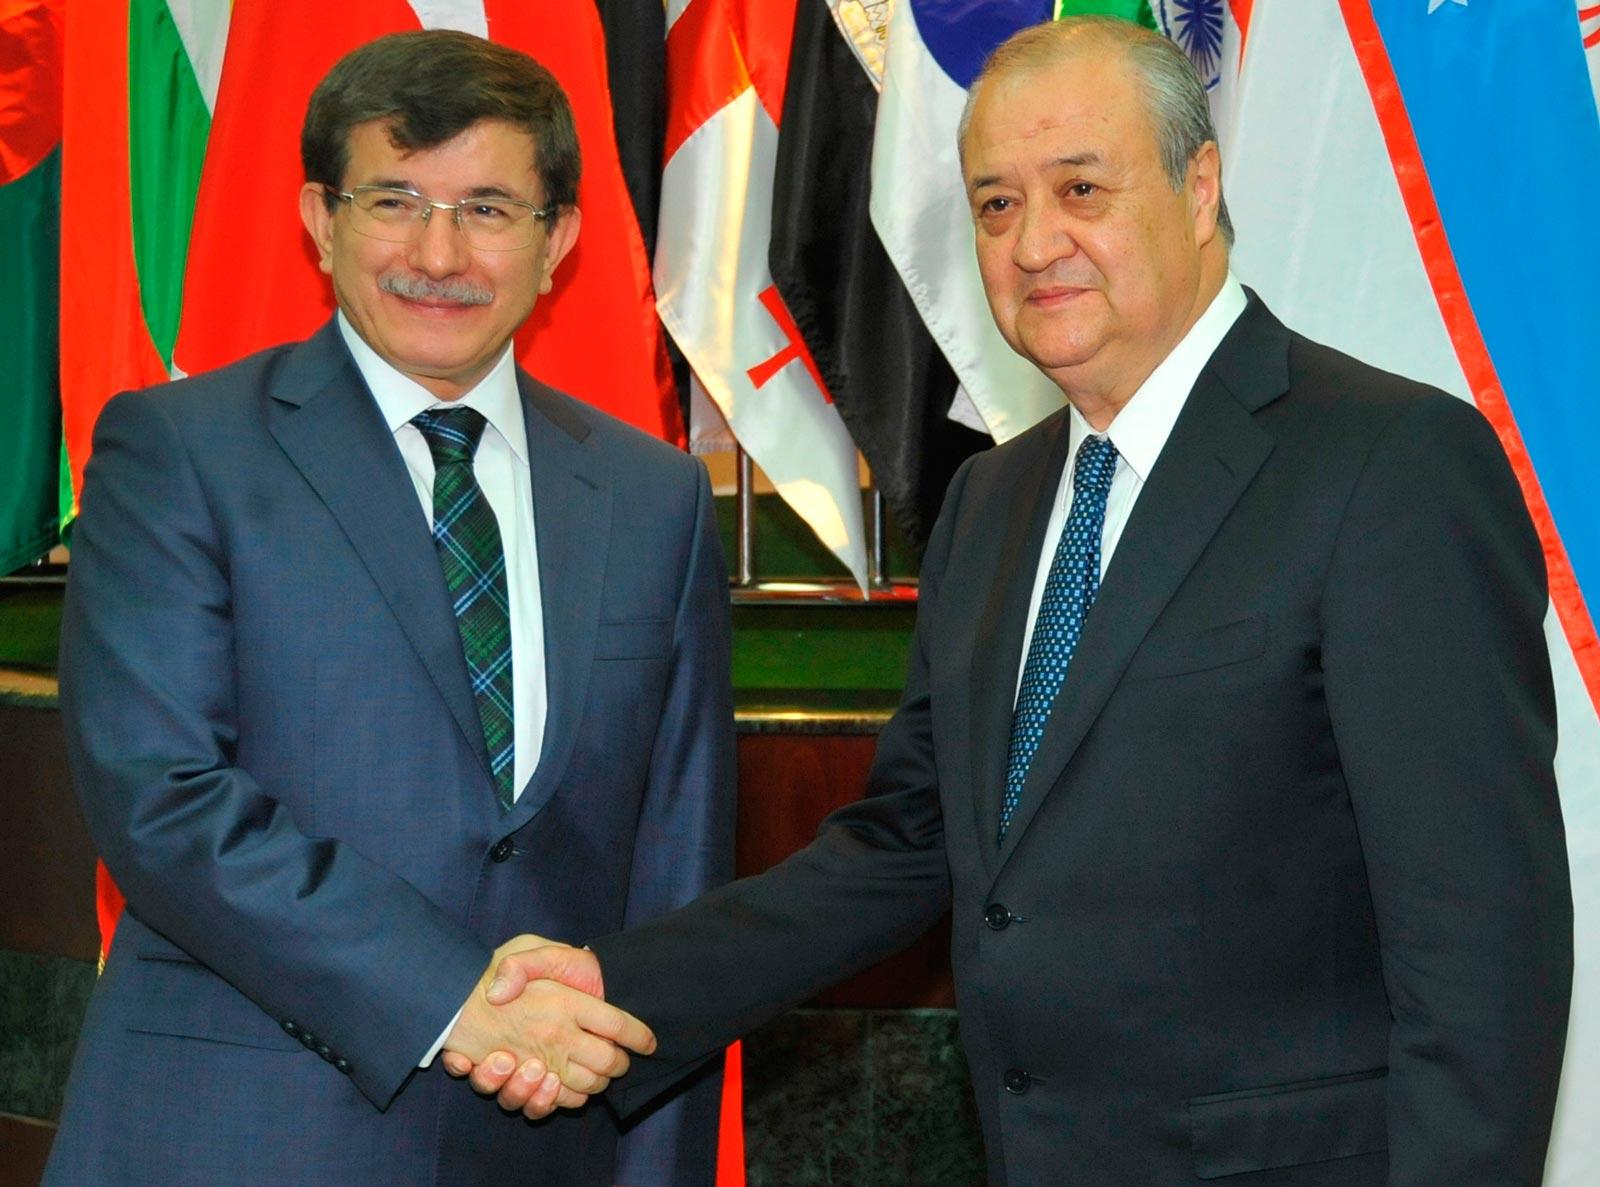 Ахмет Давутоглу: «Пока сильны Узбекистан и Турция